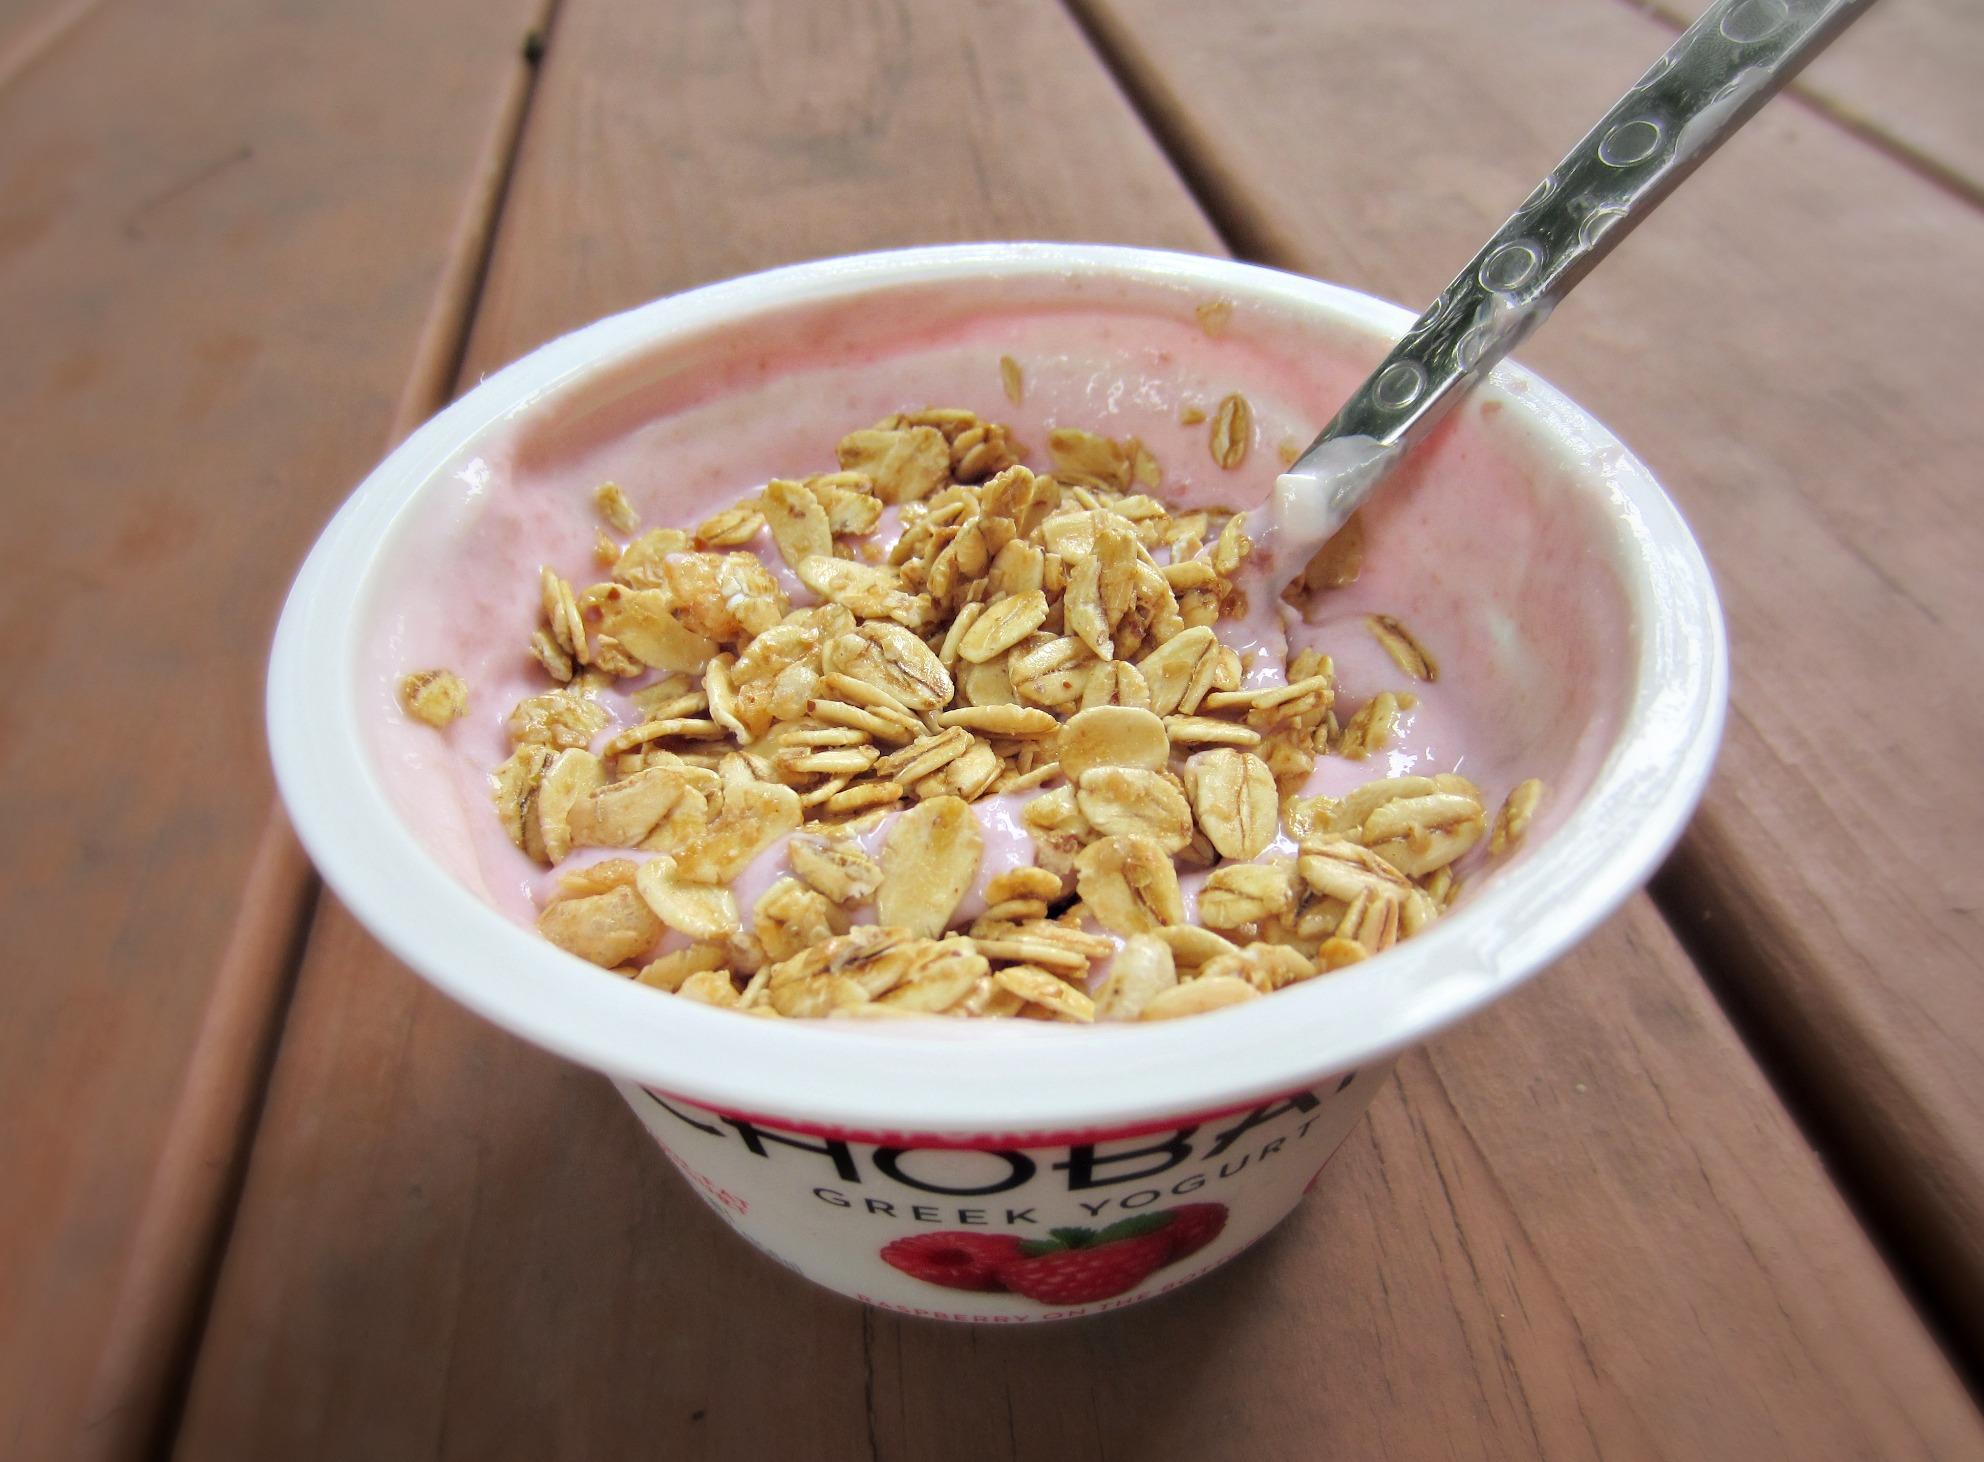 Raspberry Greek yogurt healthy snack